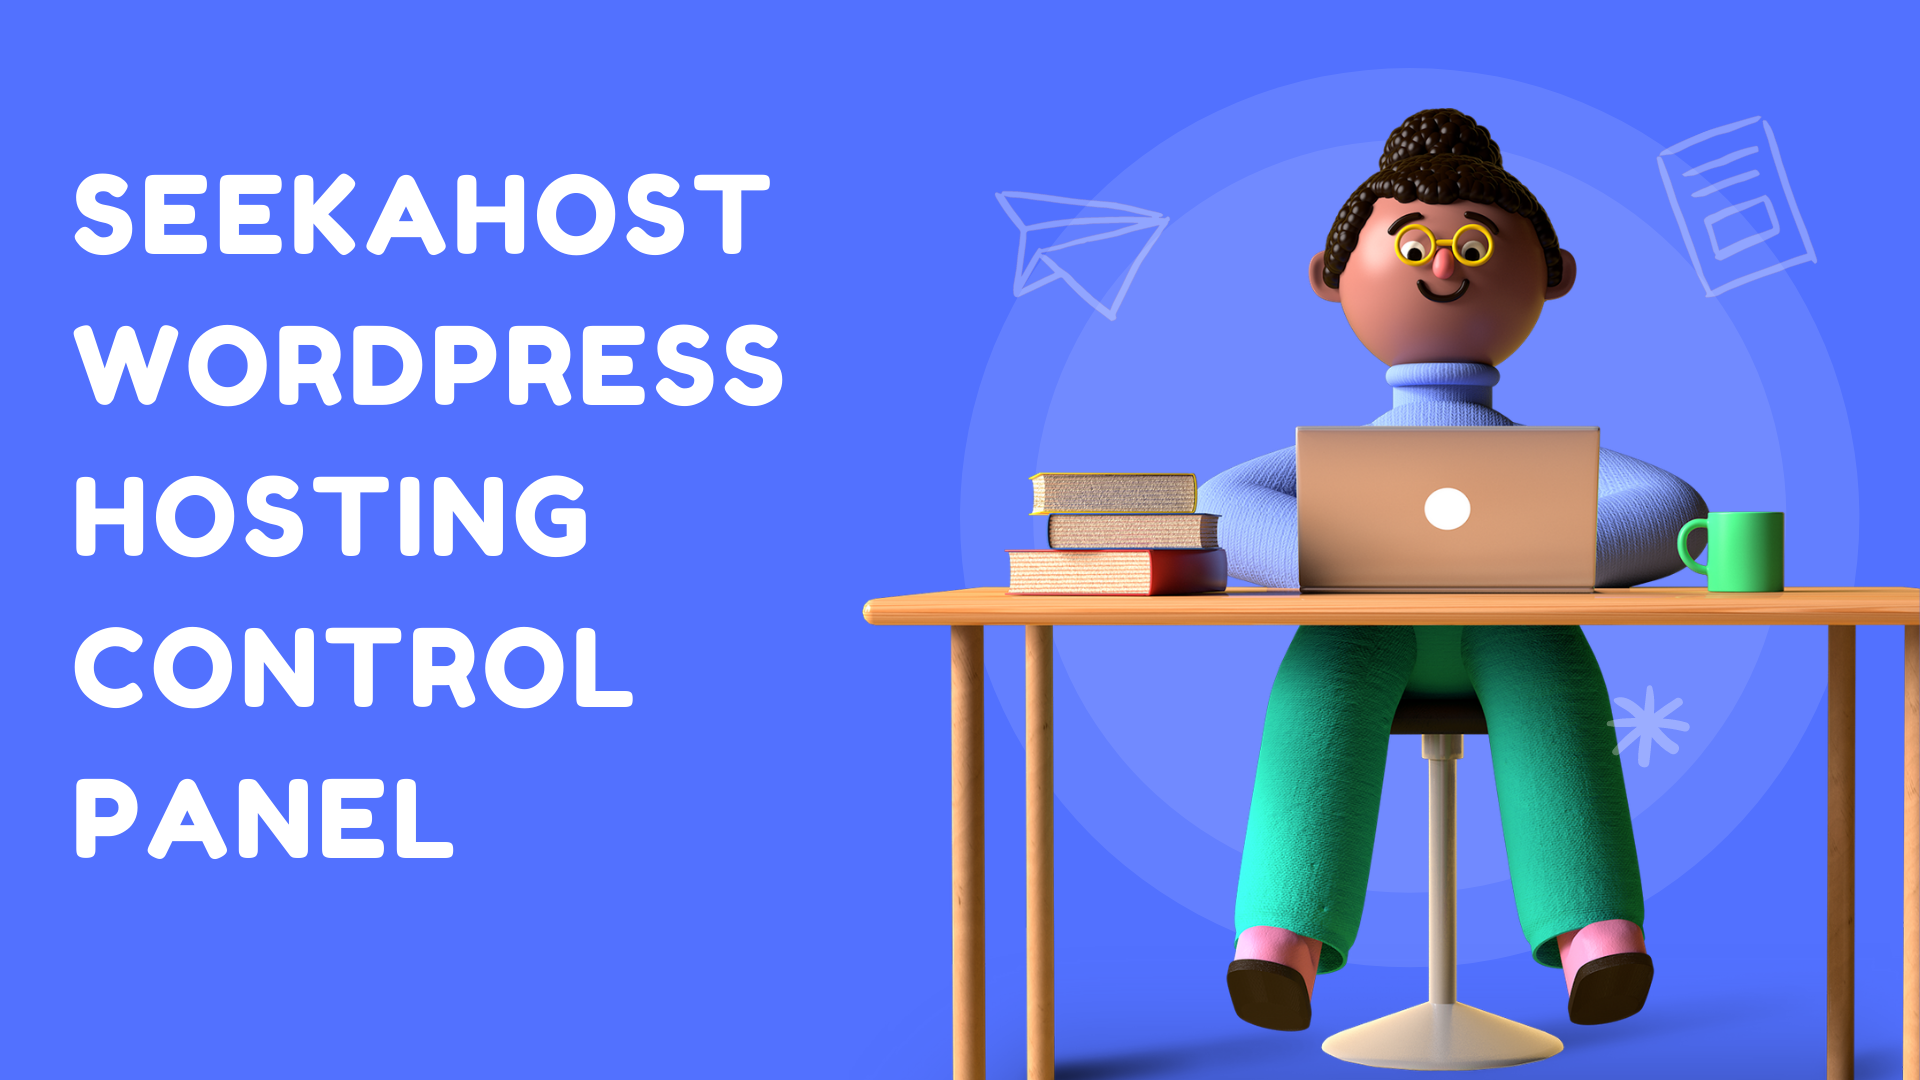 SeekaHost WordPress Hosting Control Panel (1)